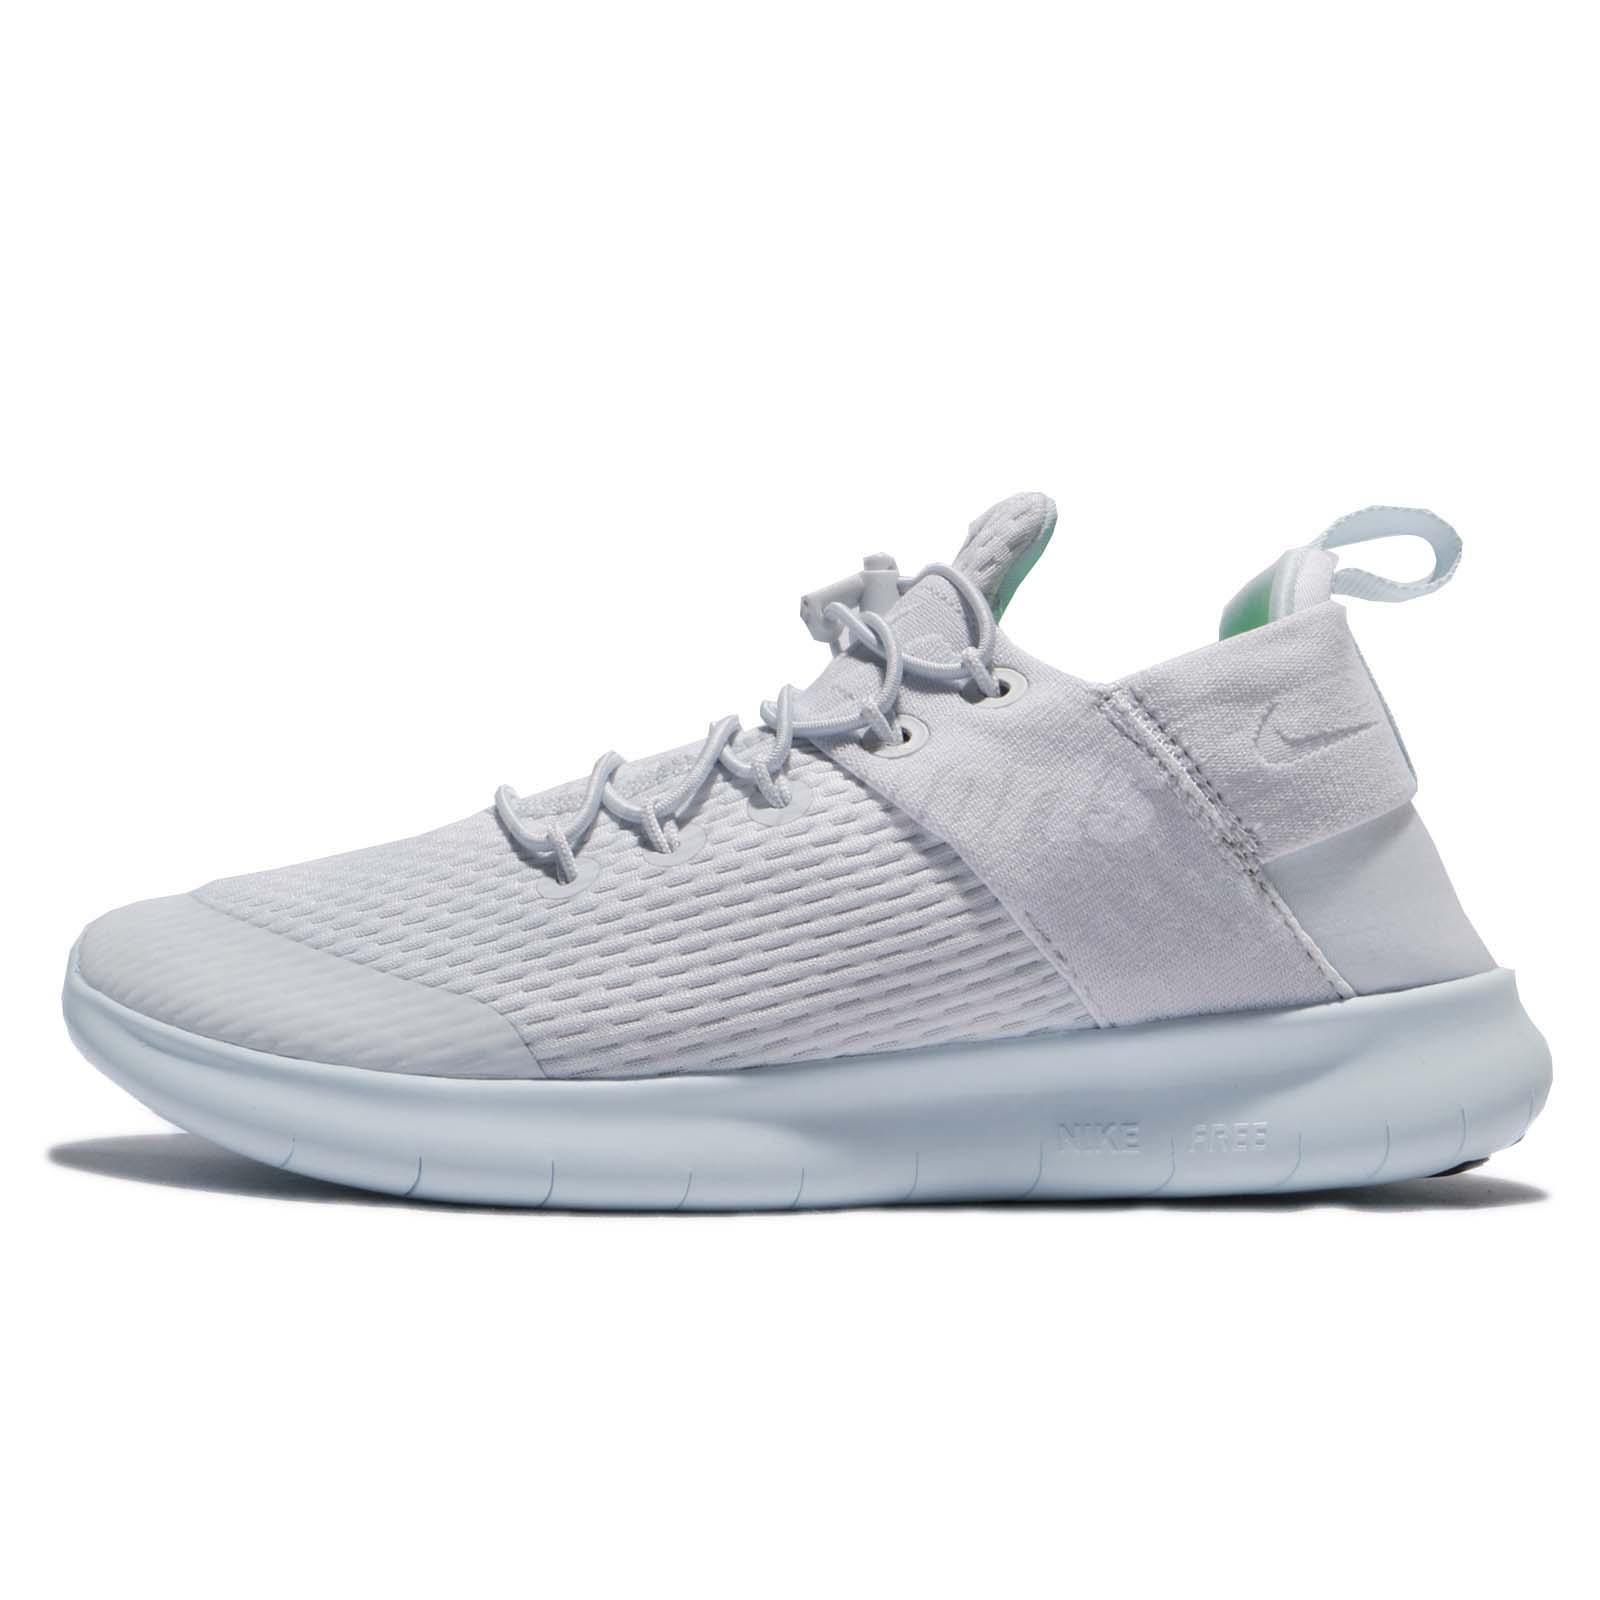 the latest 34c9f d5de4 ... where to buy wmns nike free rn cmtr 2017 run pure platinum blue women  running shoe